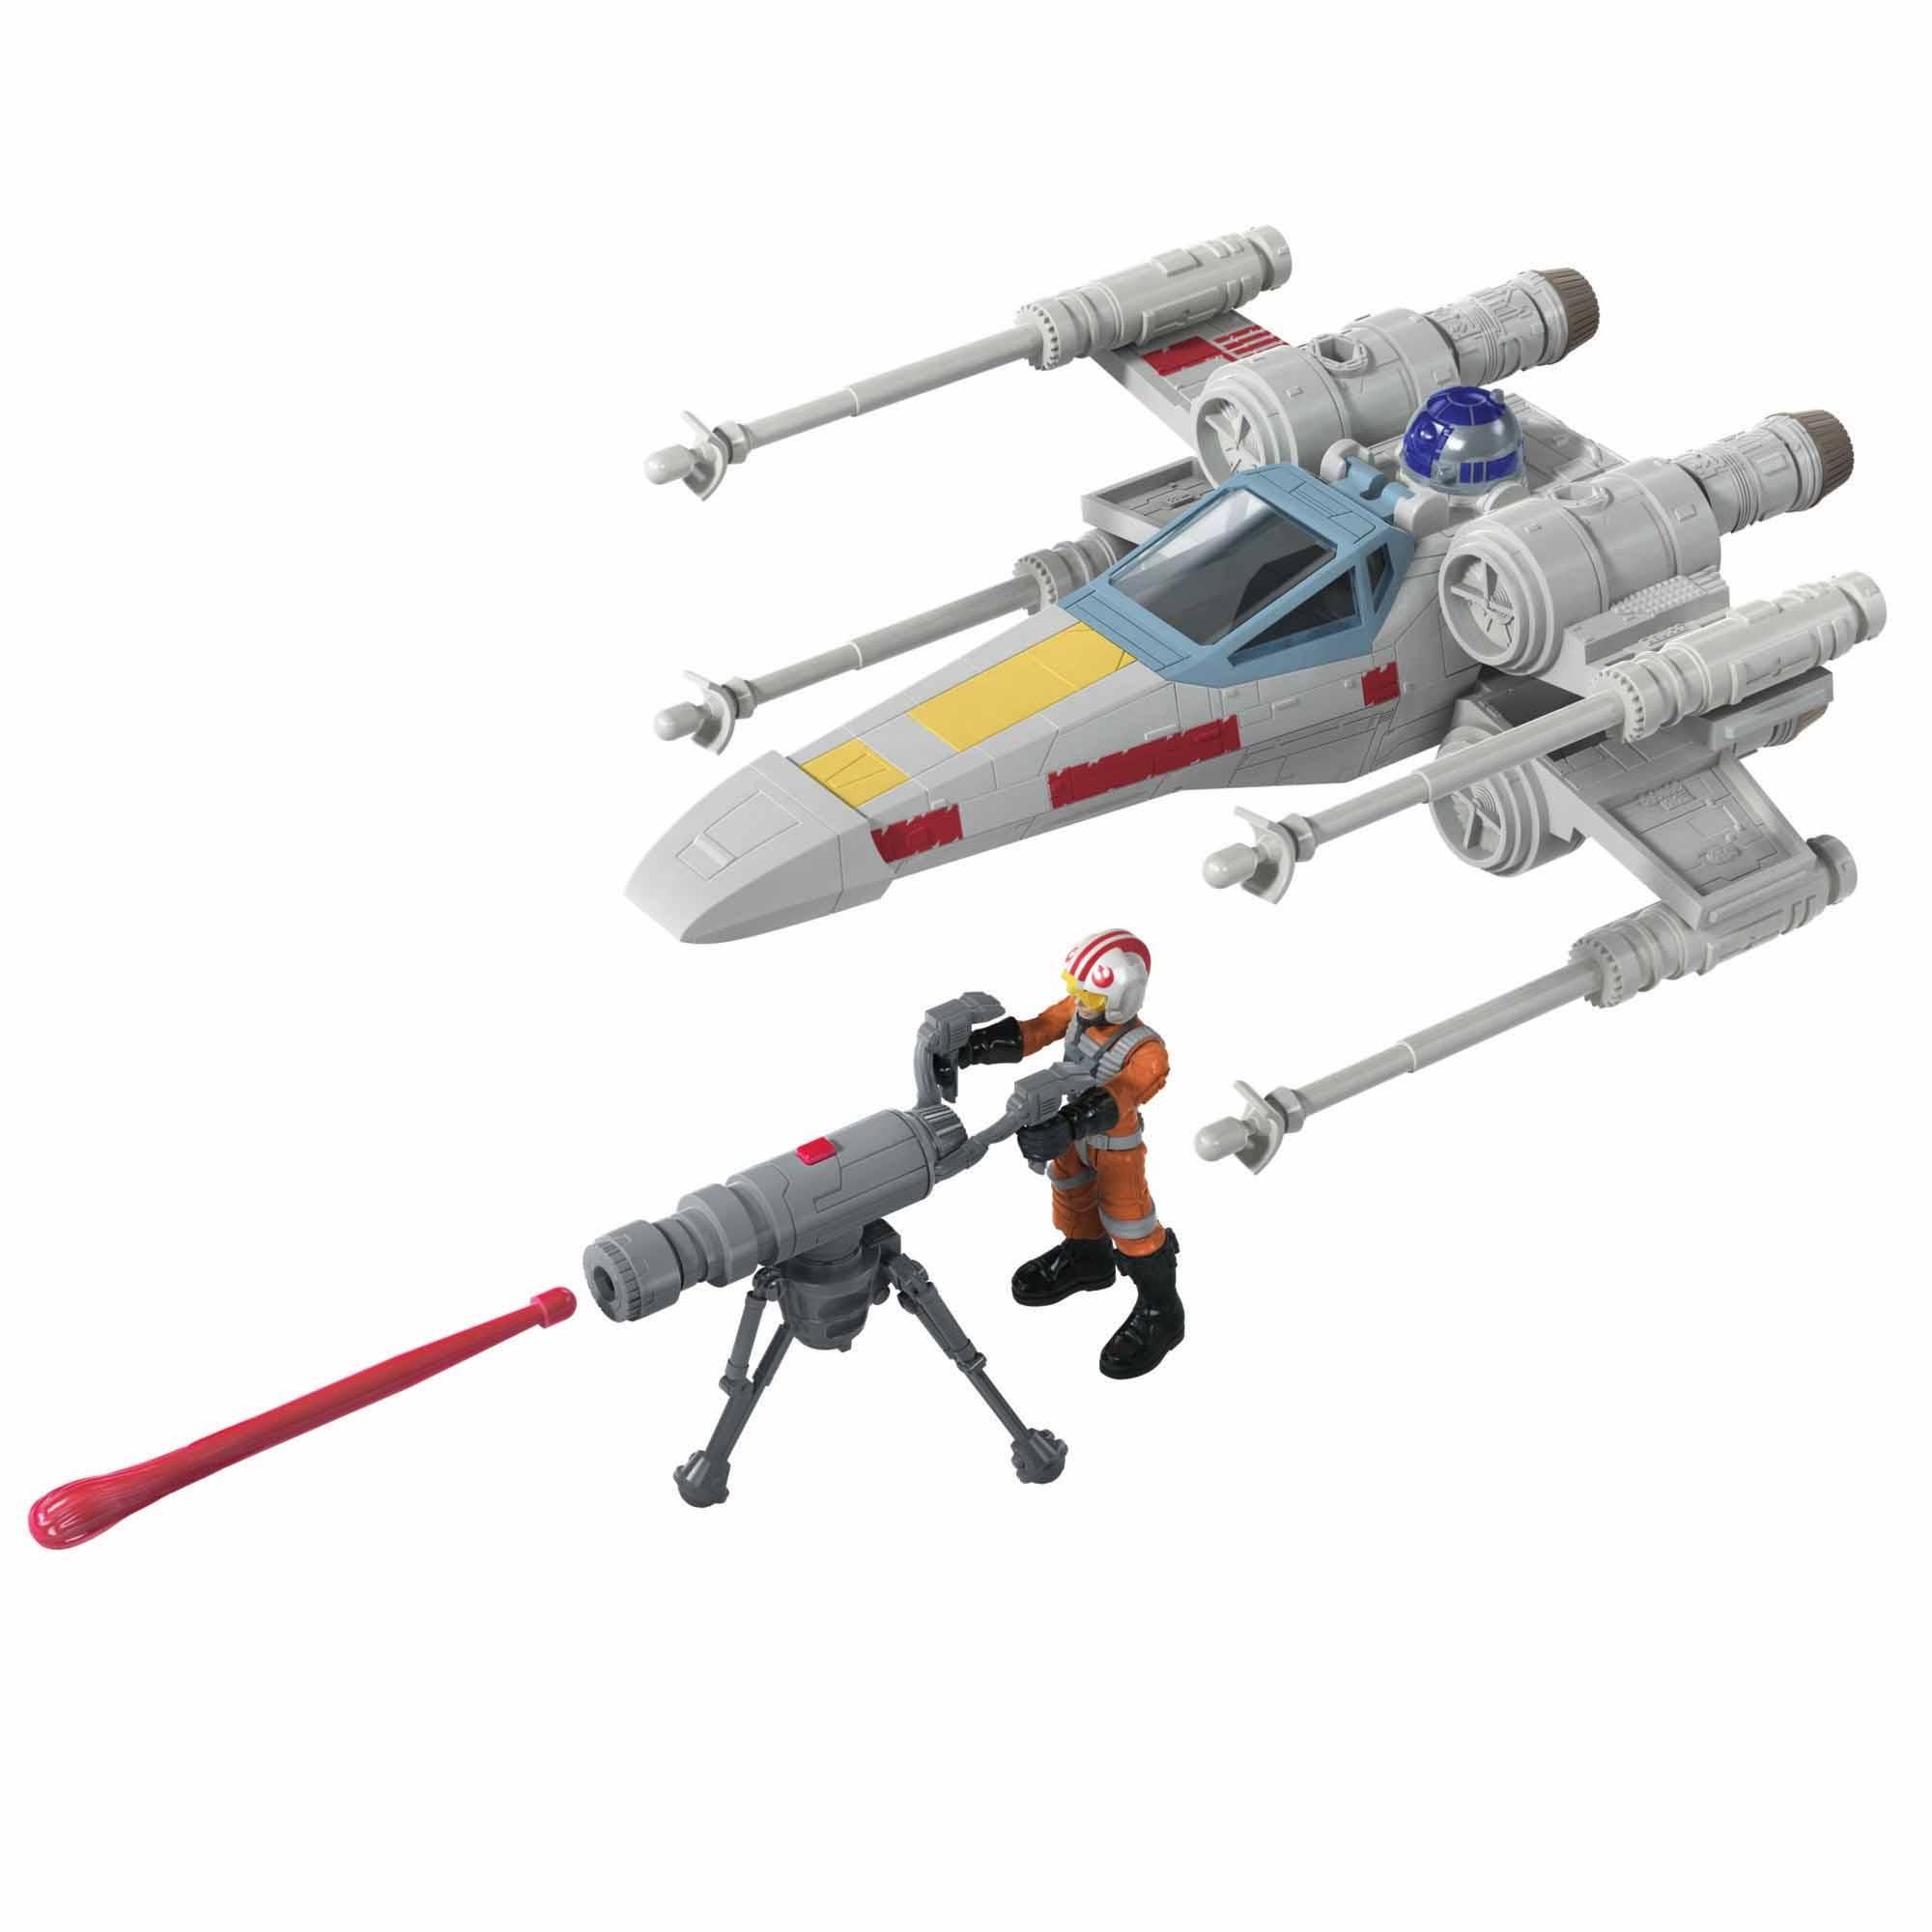 Star Wars Mission Fleet, Luke Skywalker et chasseur X-wing, figurine de 6 cm avec véhicule, dès 4 ans